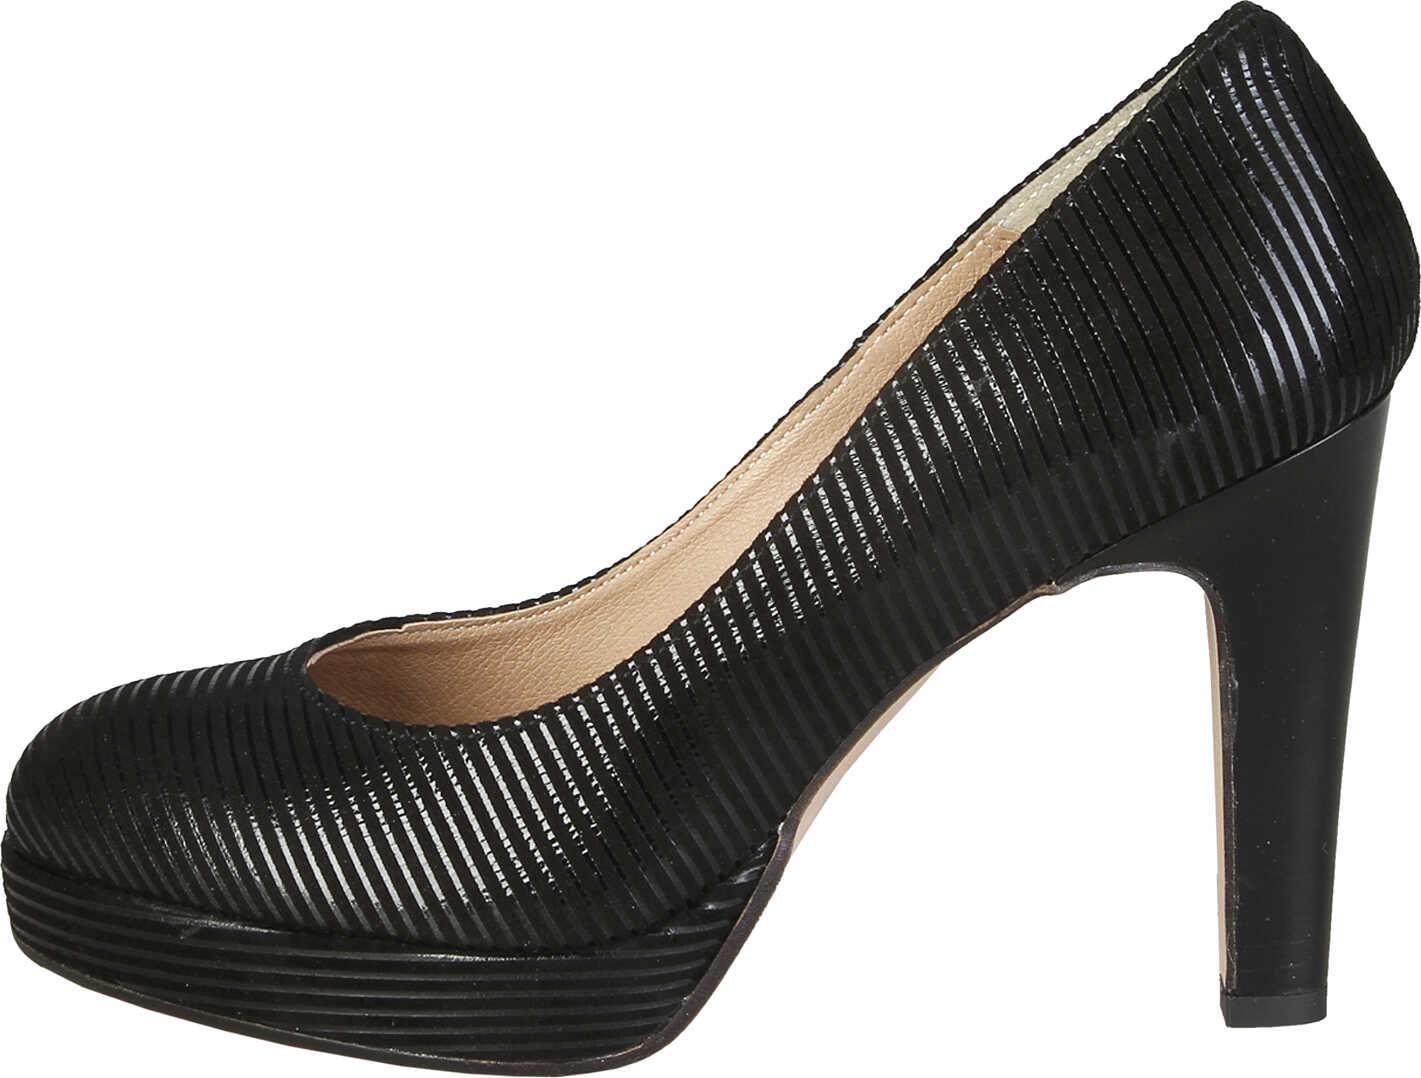 Pantofi Cu Toc Versace 1969 Melodie Black